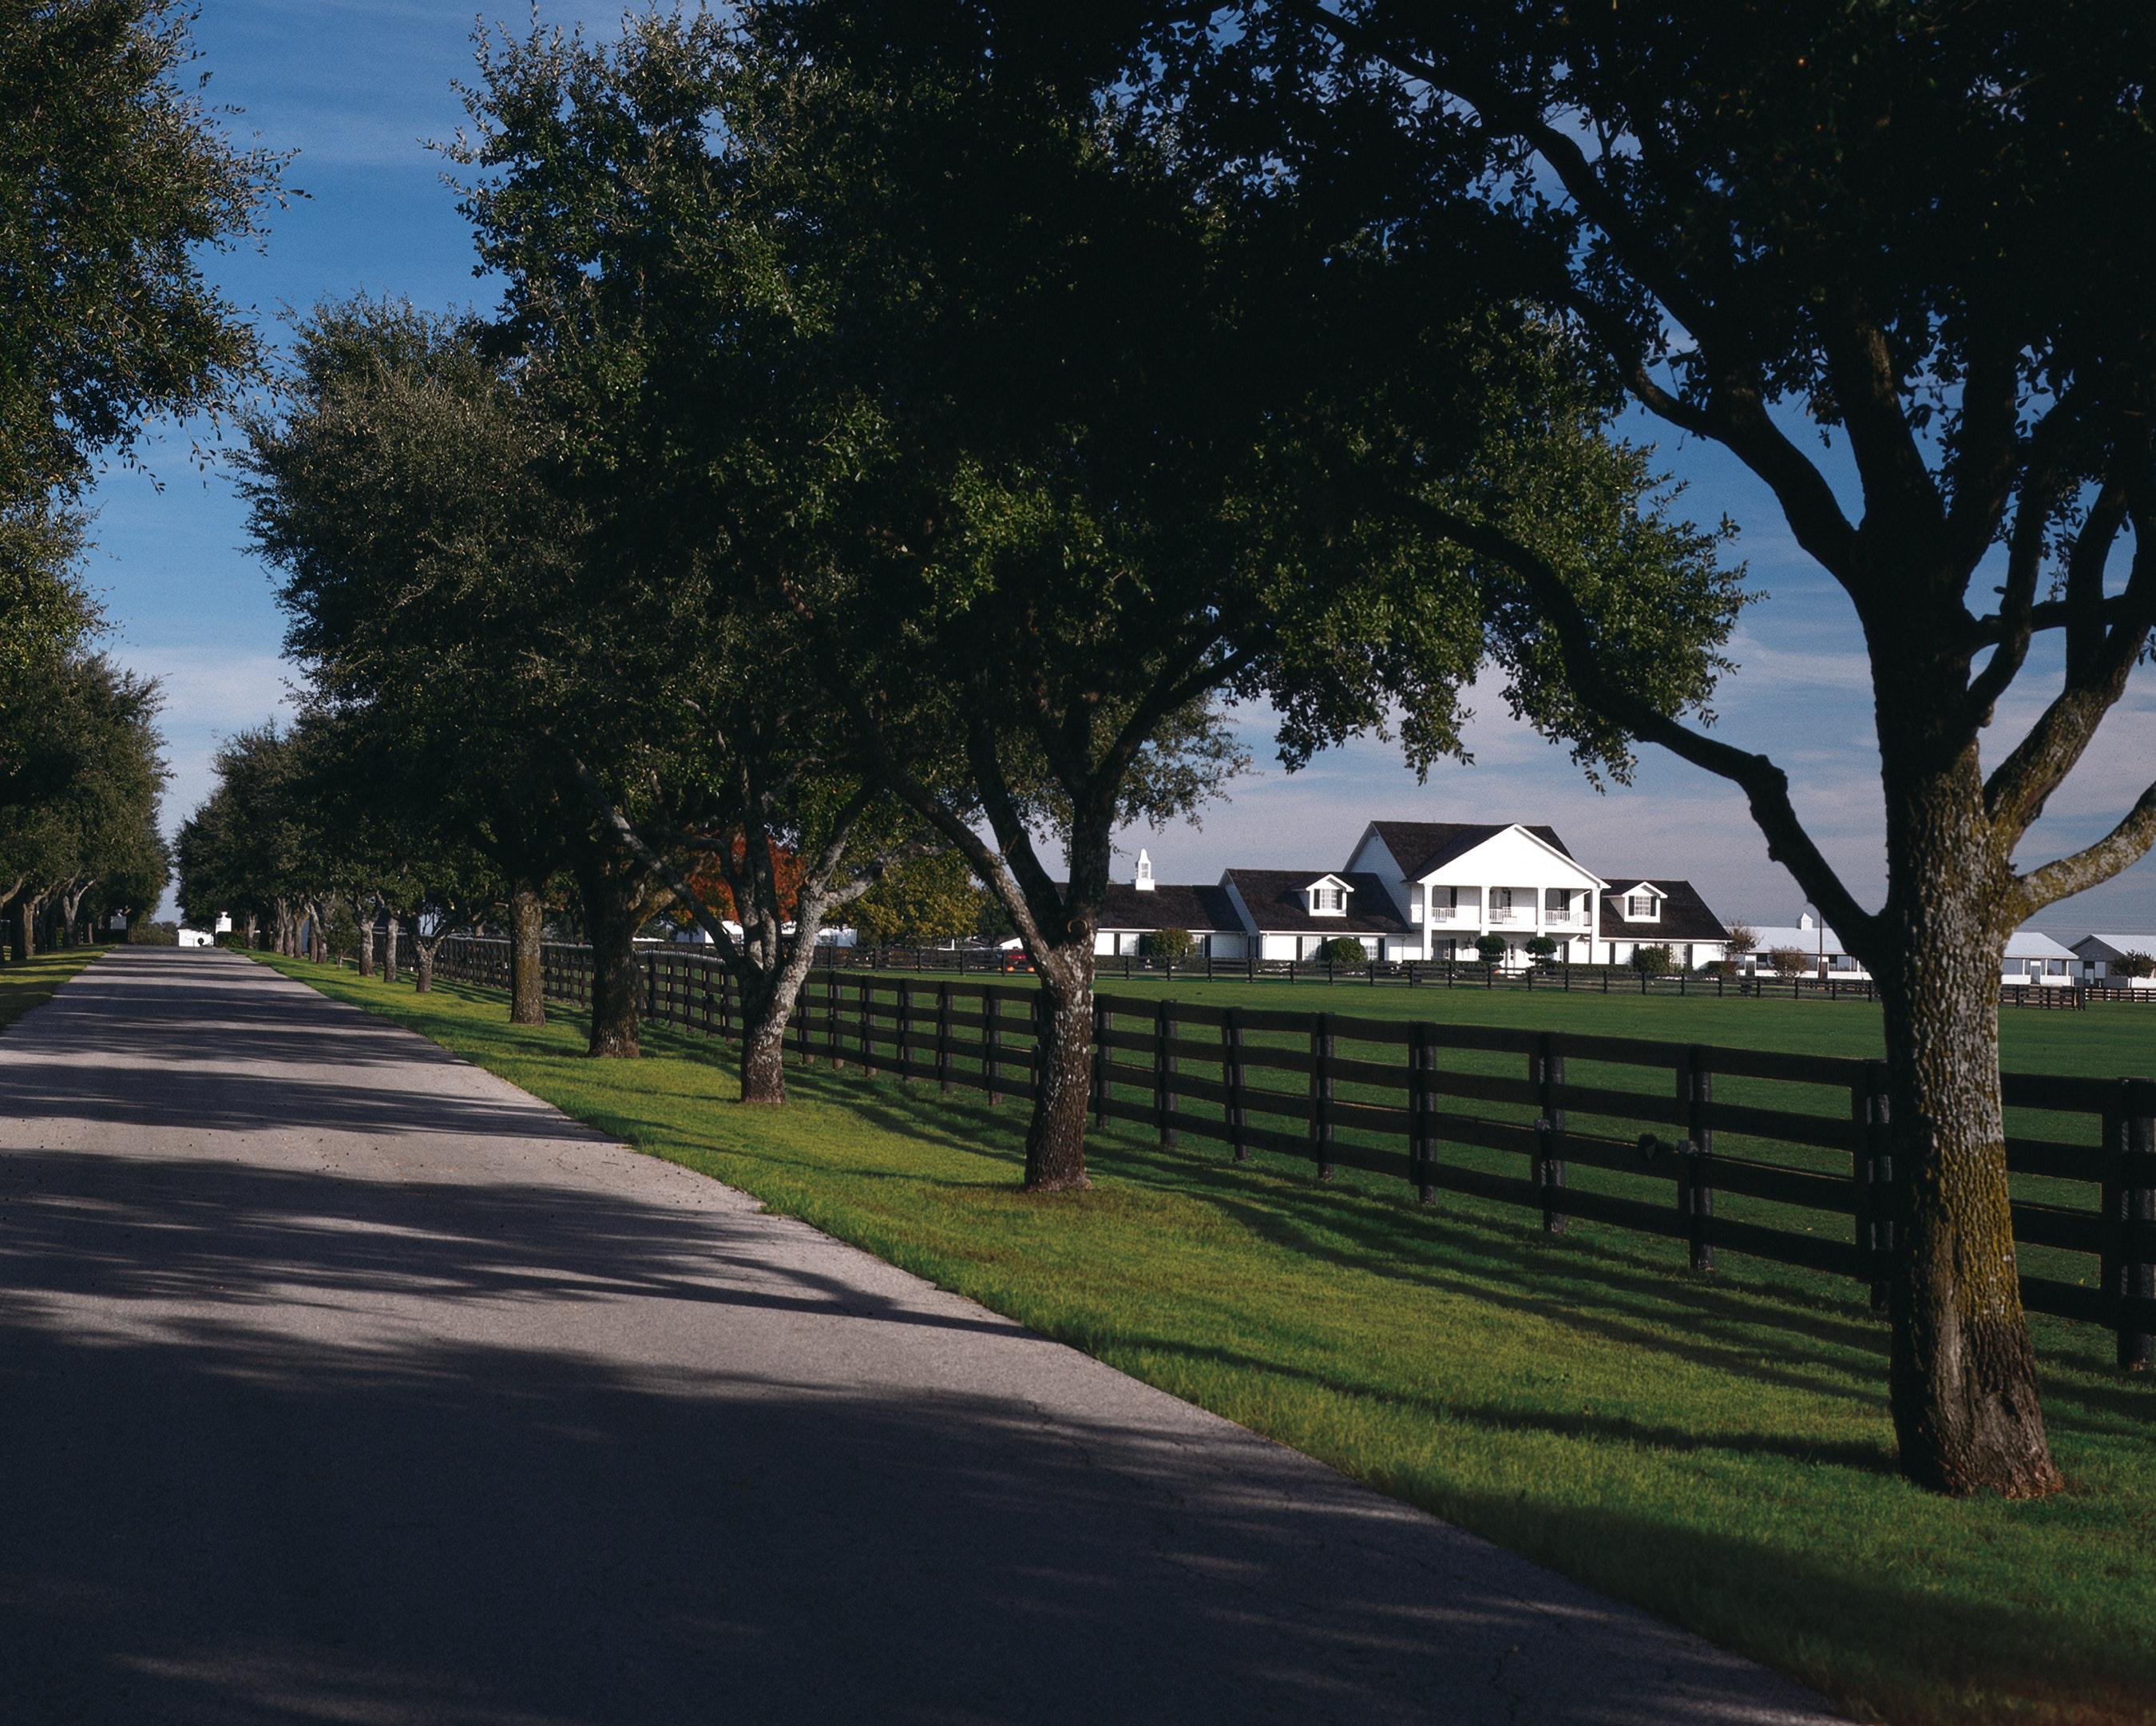 Southfork Ranch Event U0026 Conference Center: Parker, TX 75002: Visit Dallas